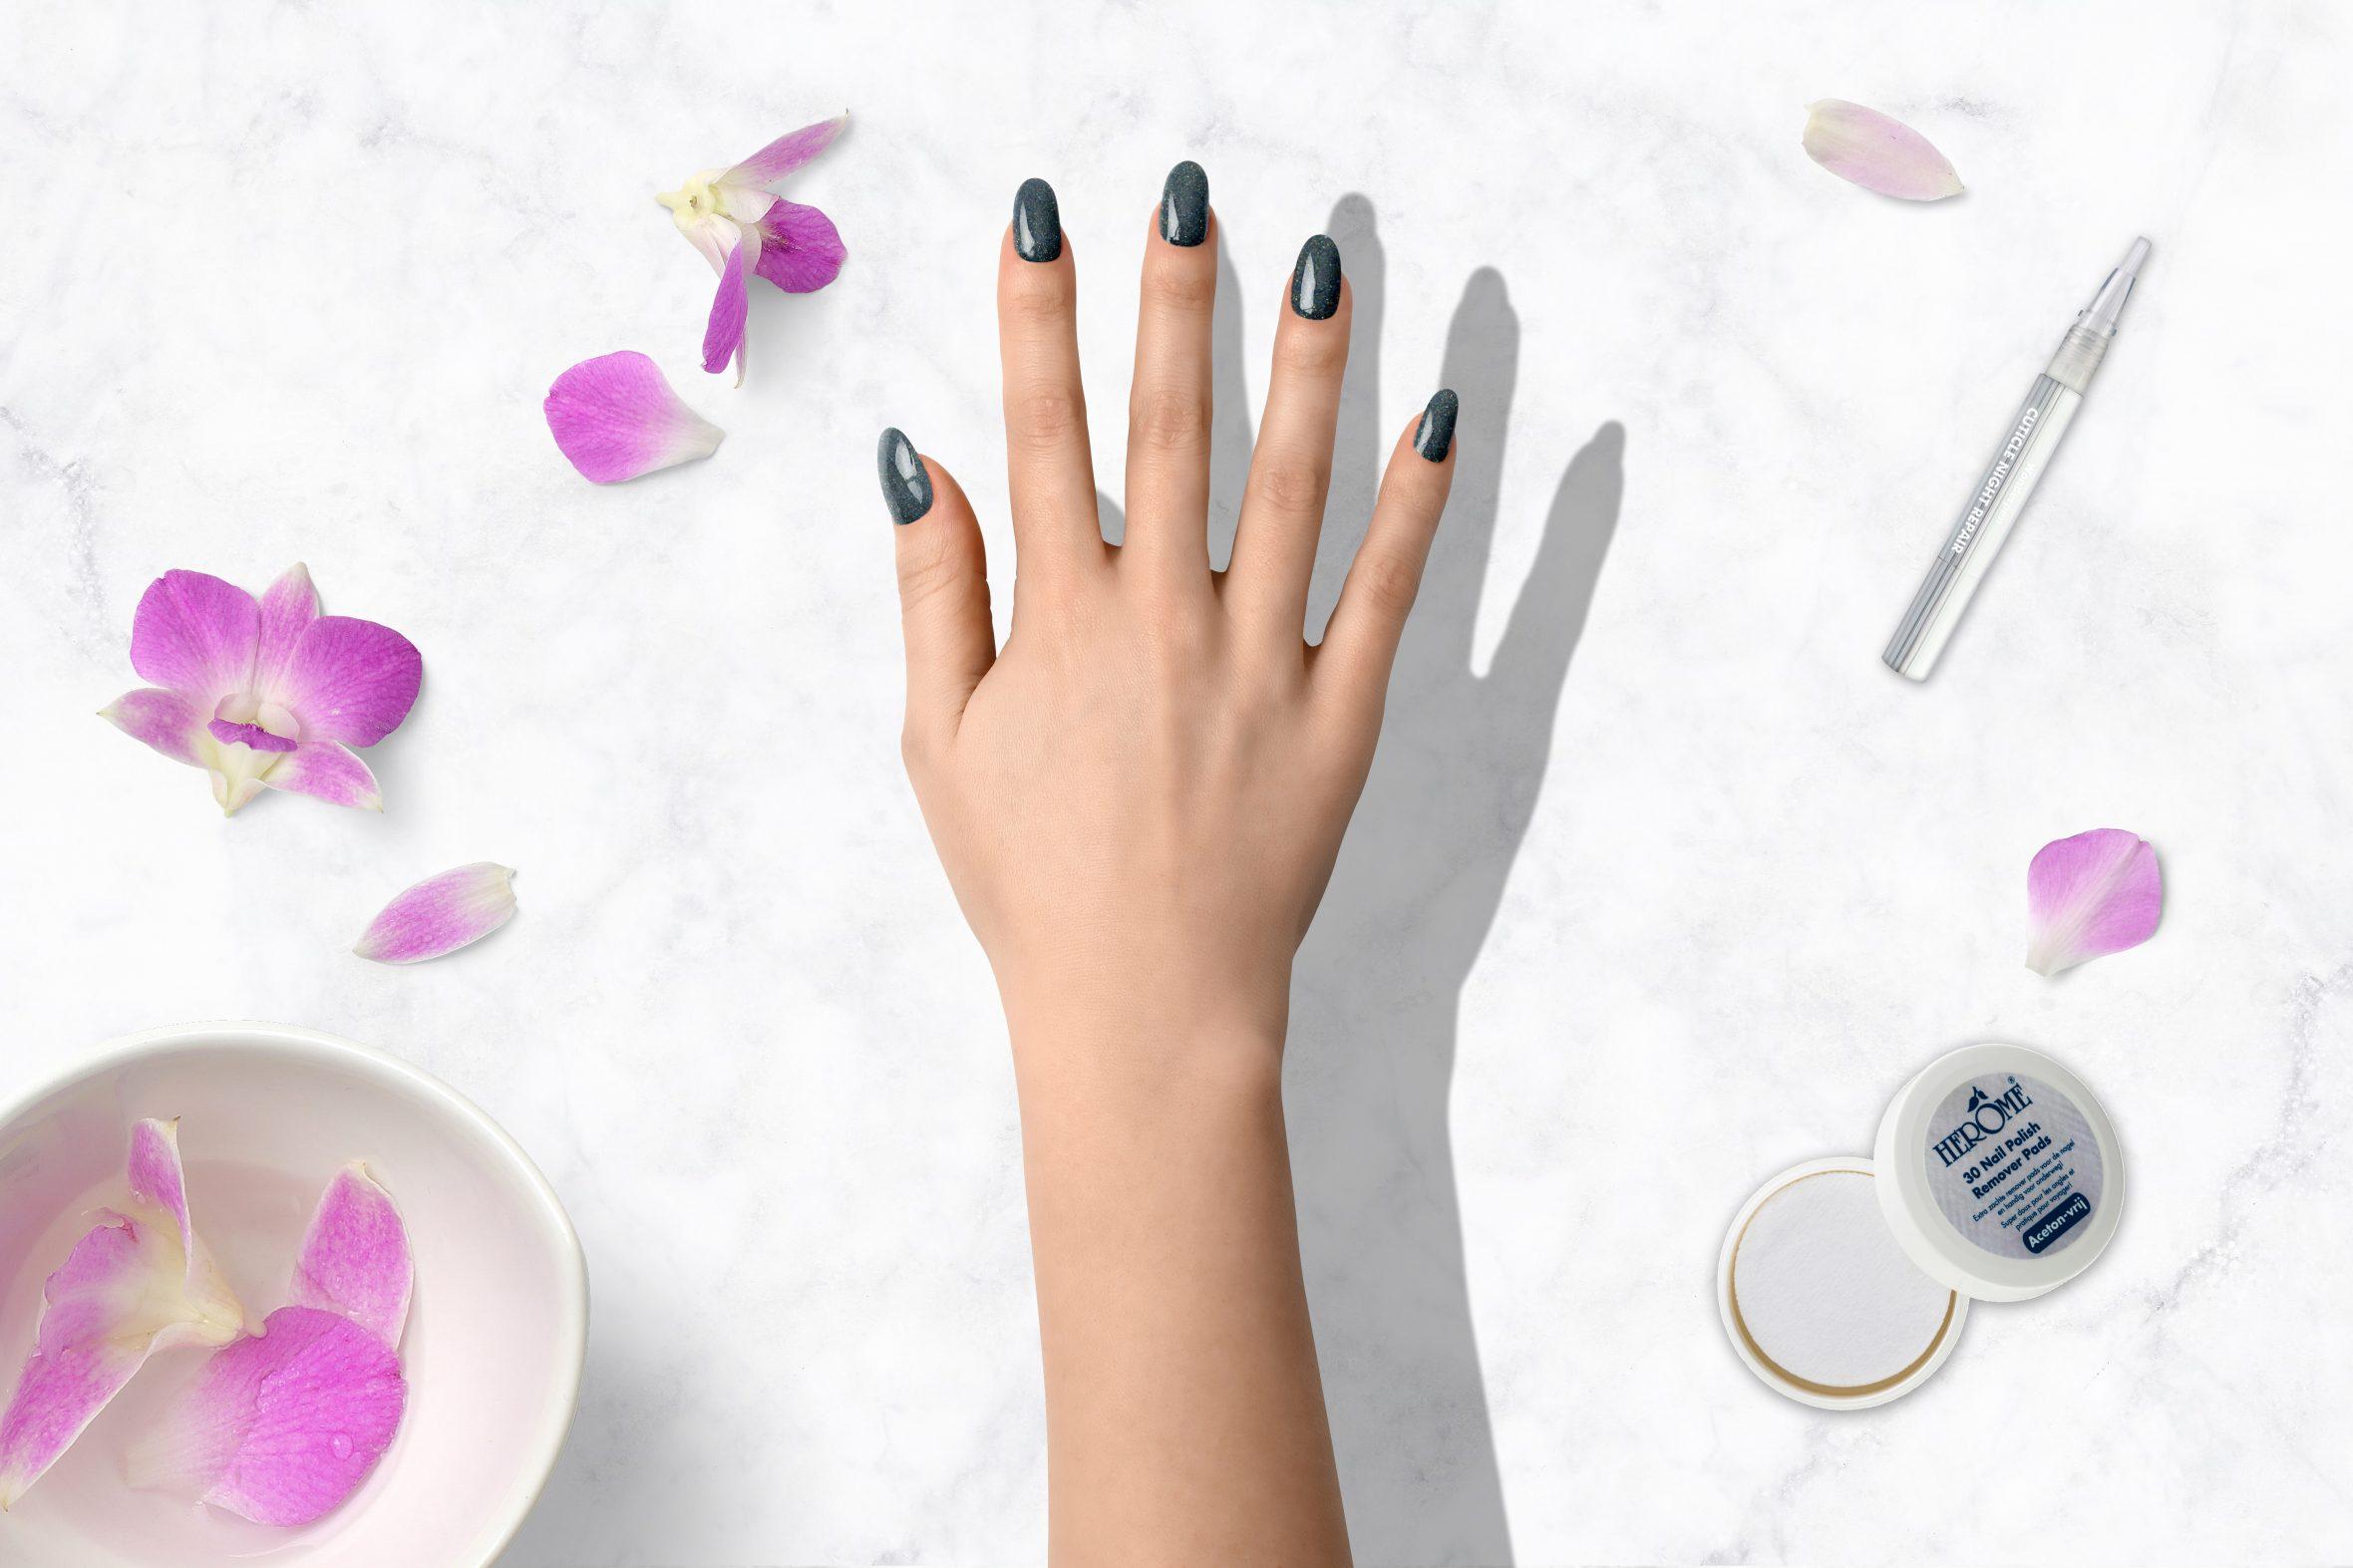 glitter nagellak kleurnummer 180 van de Herôme nagellak collectie